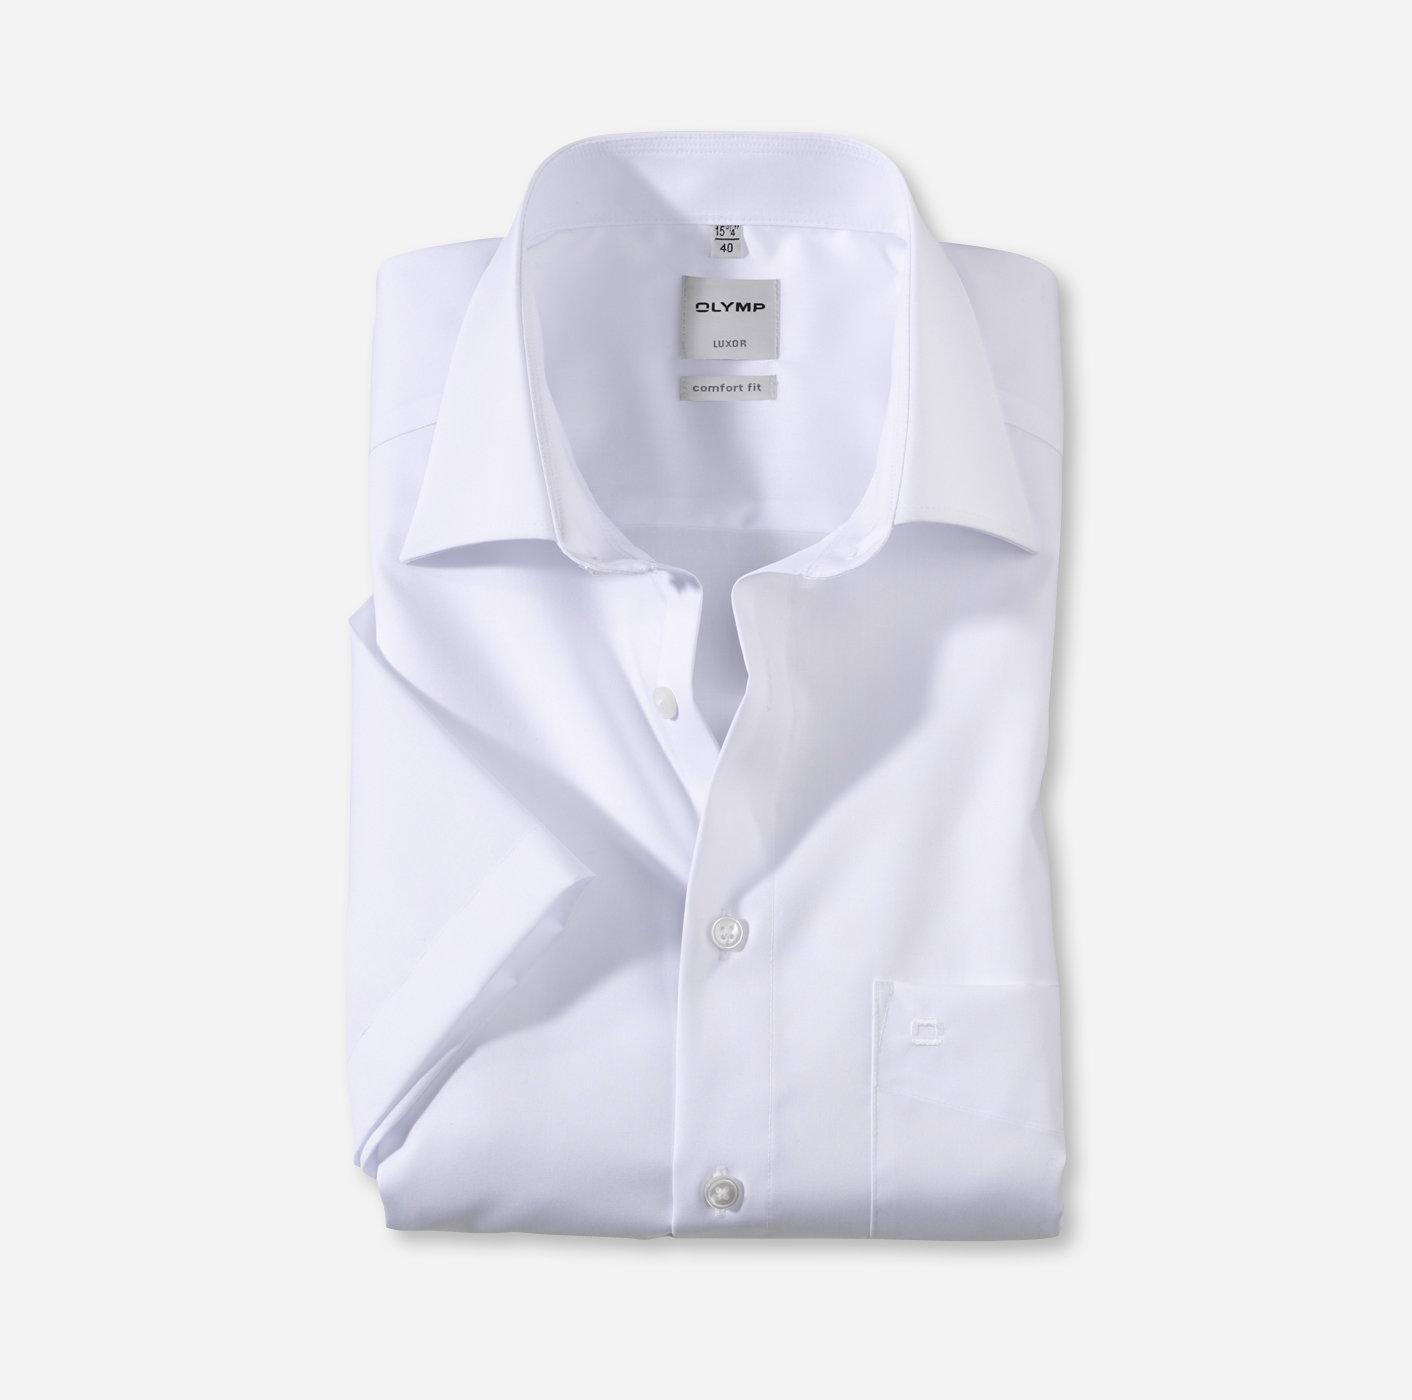 Oberhemd Luxor, 1/2 Arm, weiß, comfort fit